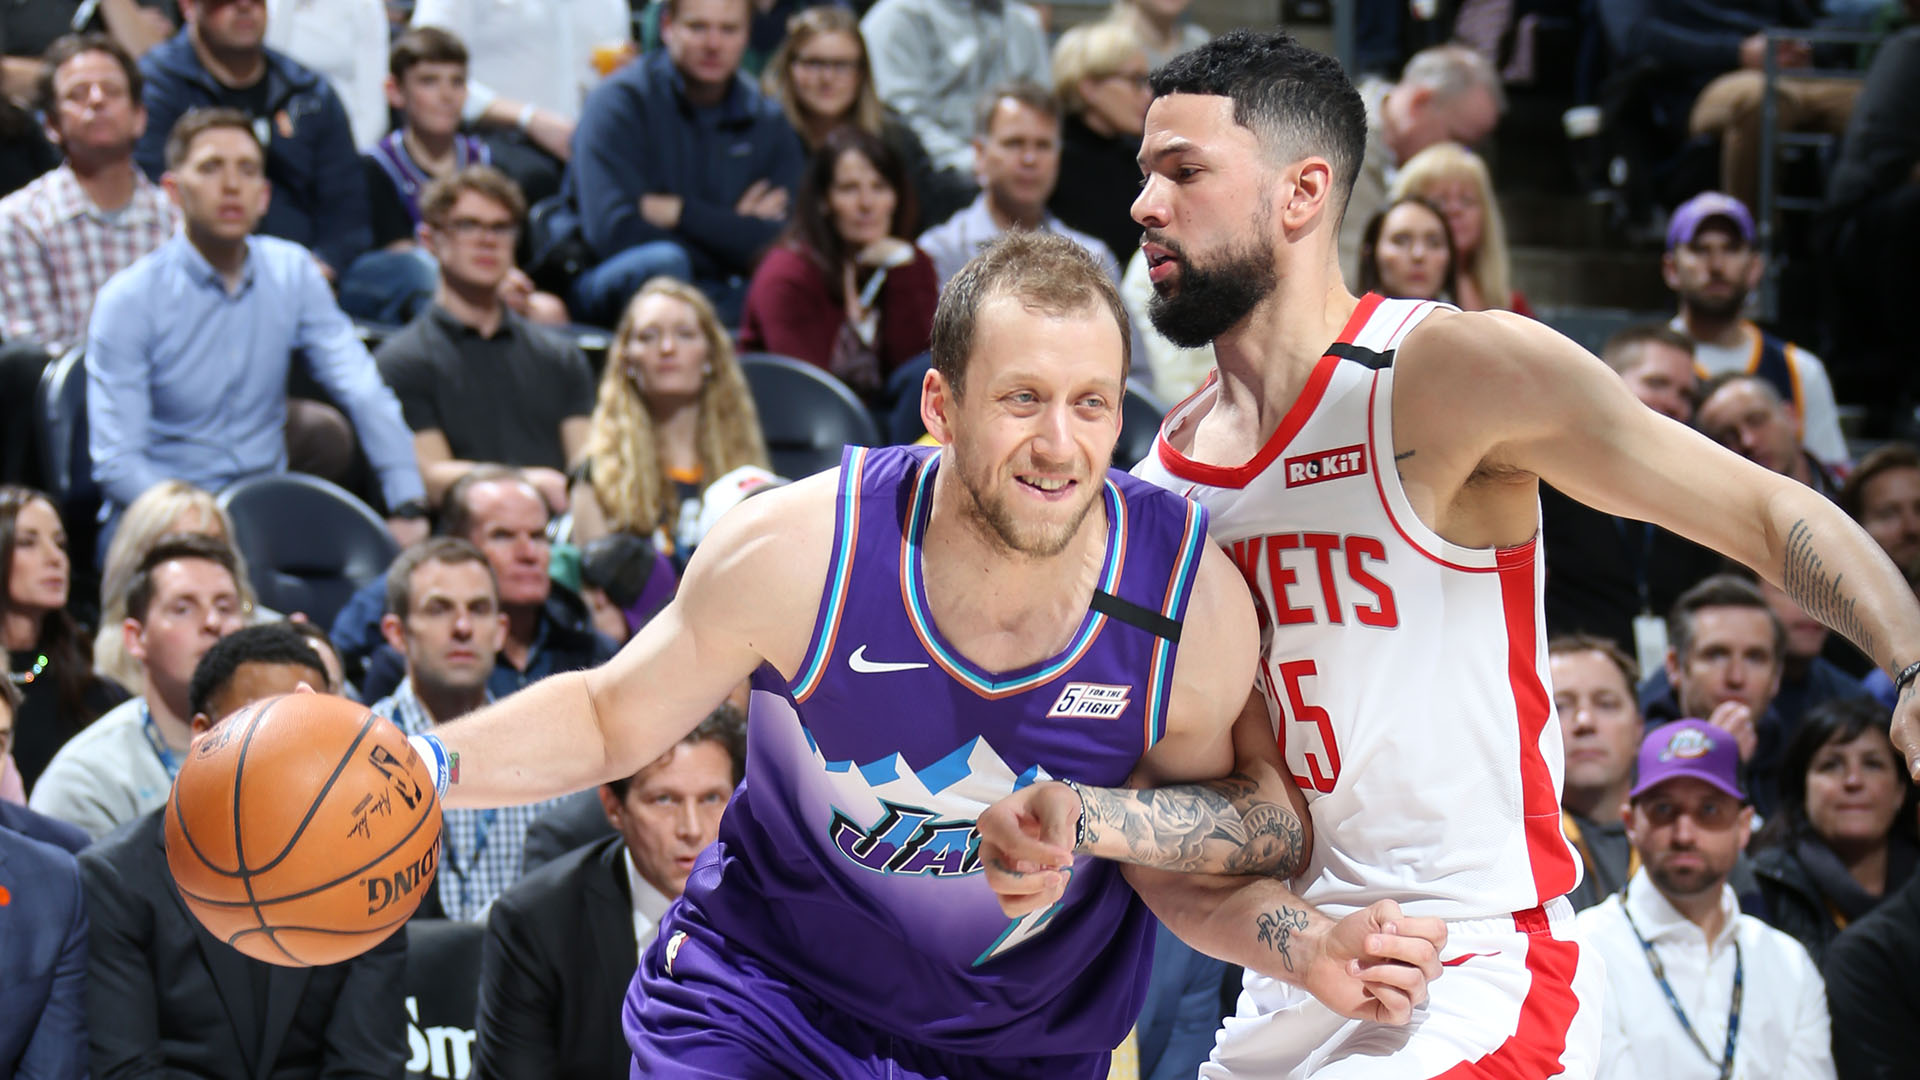 Rockets @ Jazz